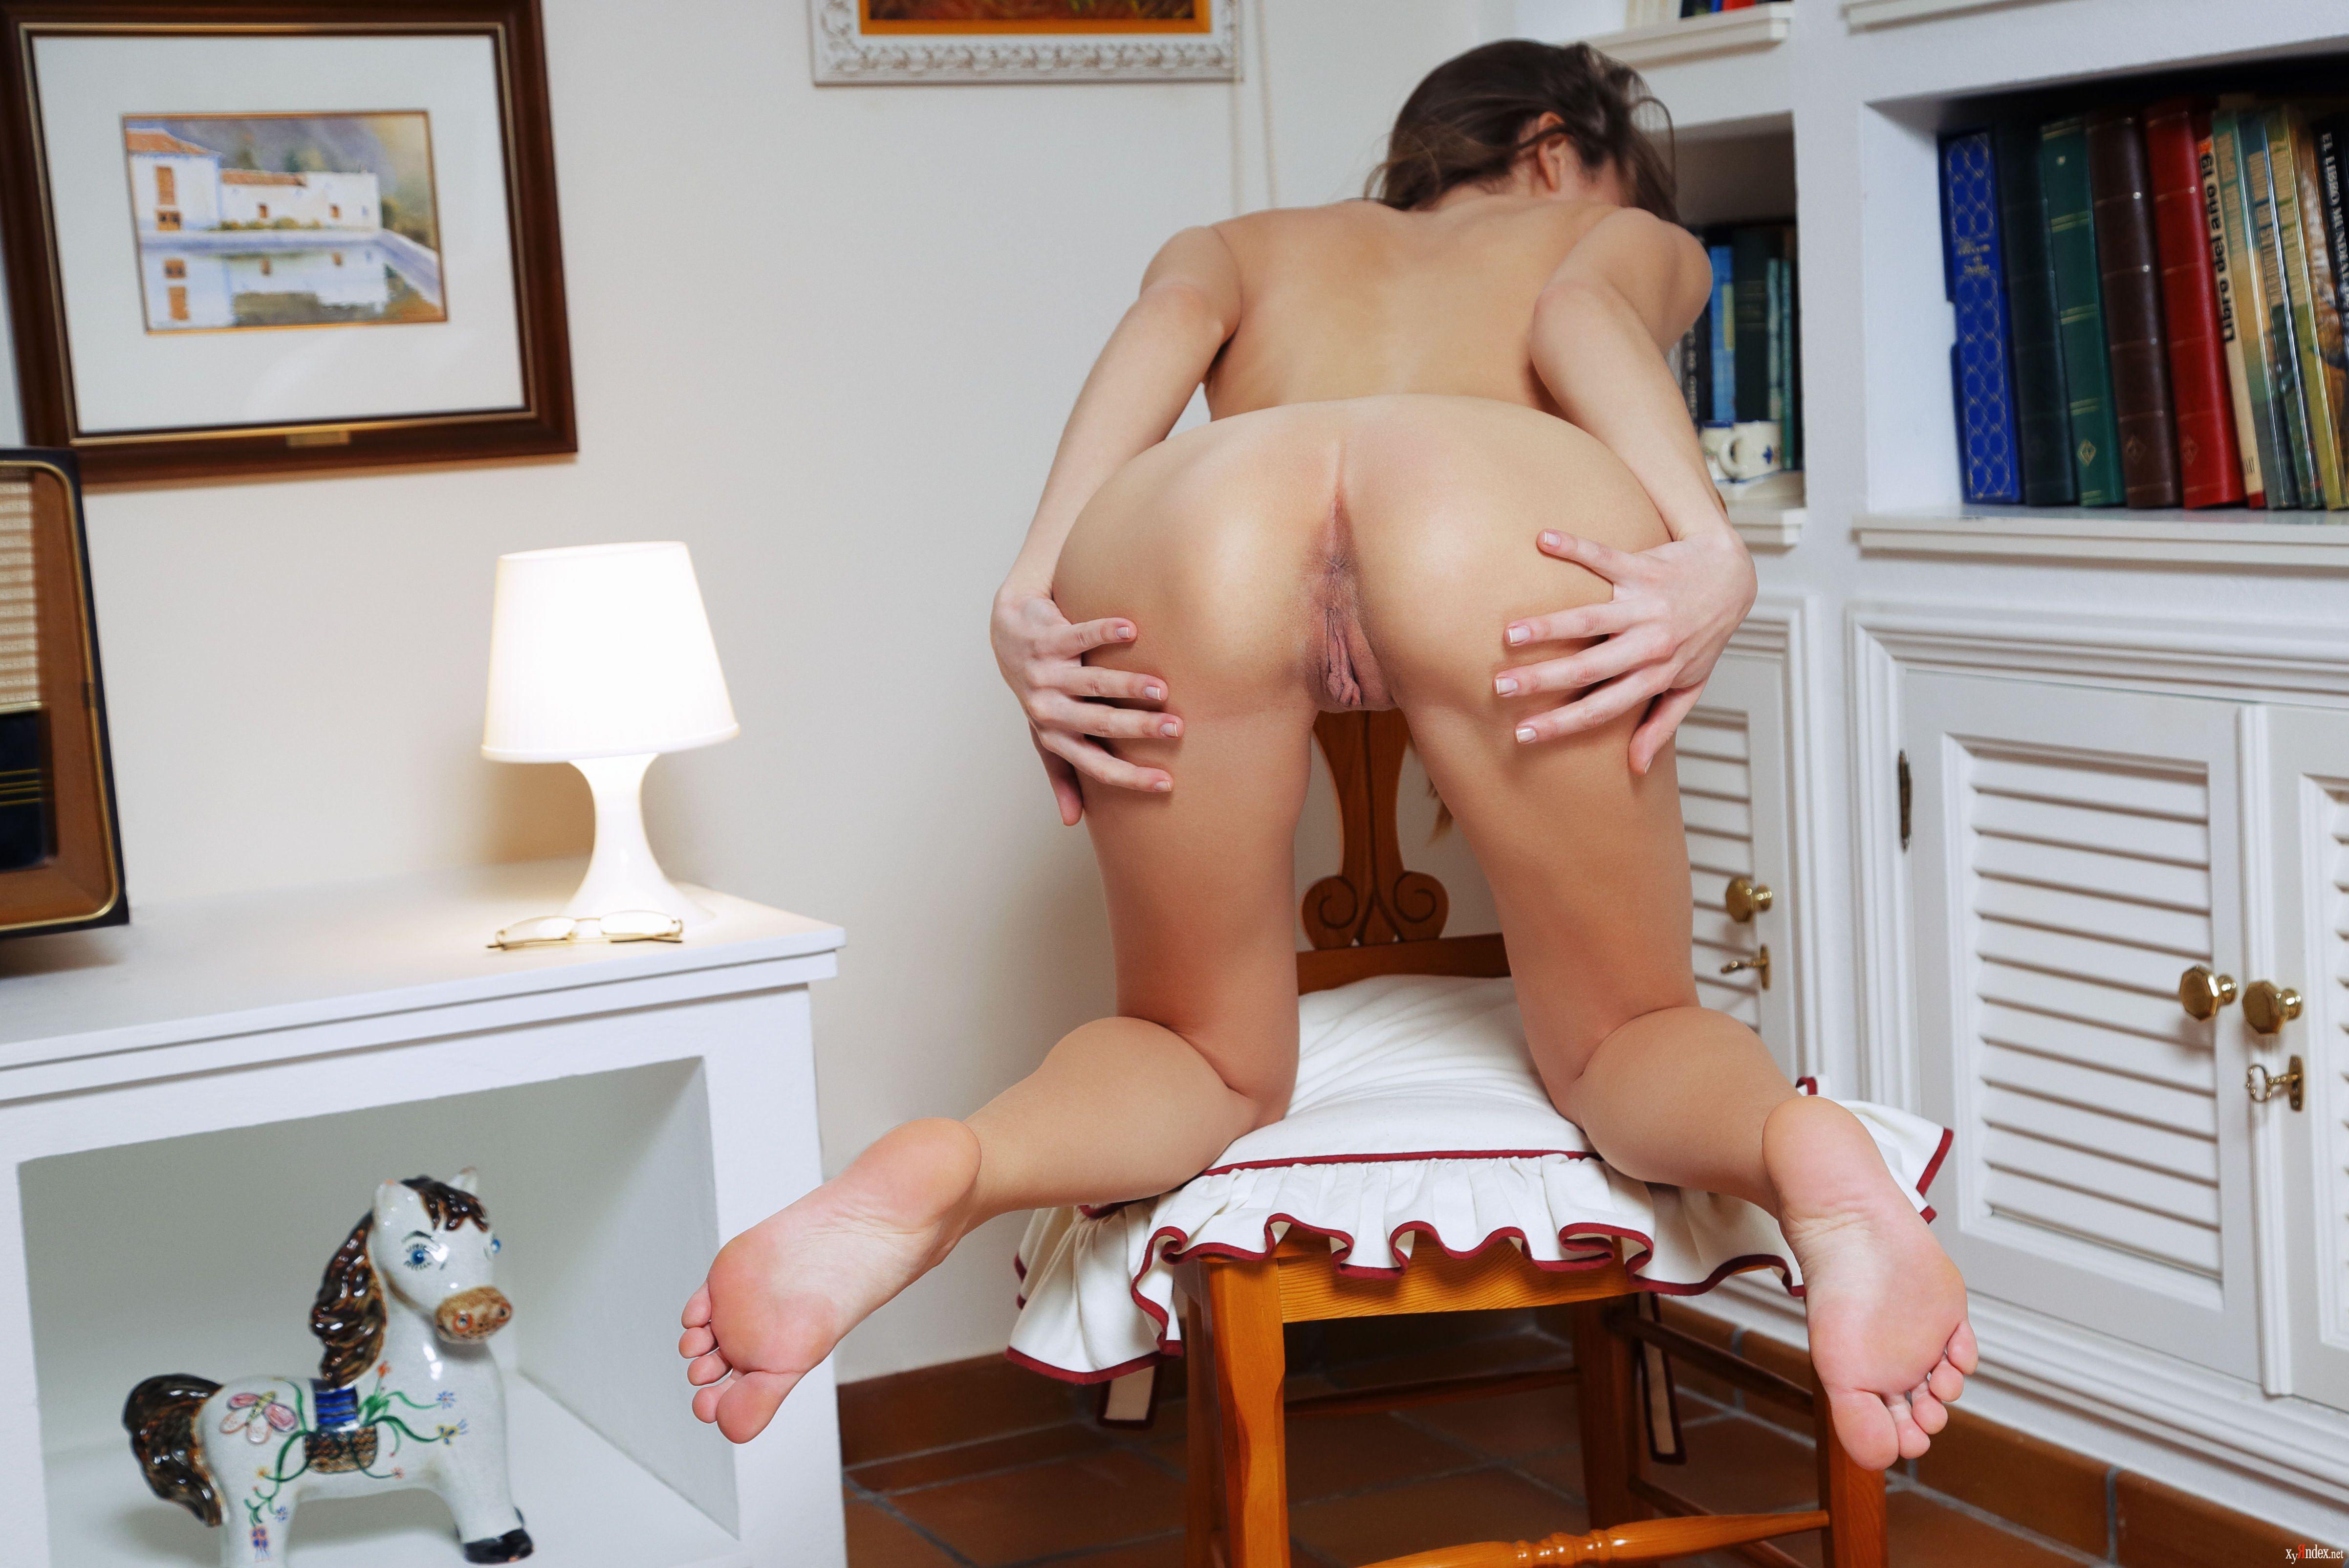 Protruding Labia Metart Erotic Galleries